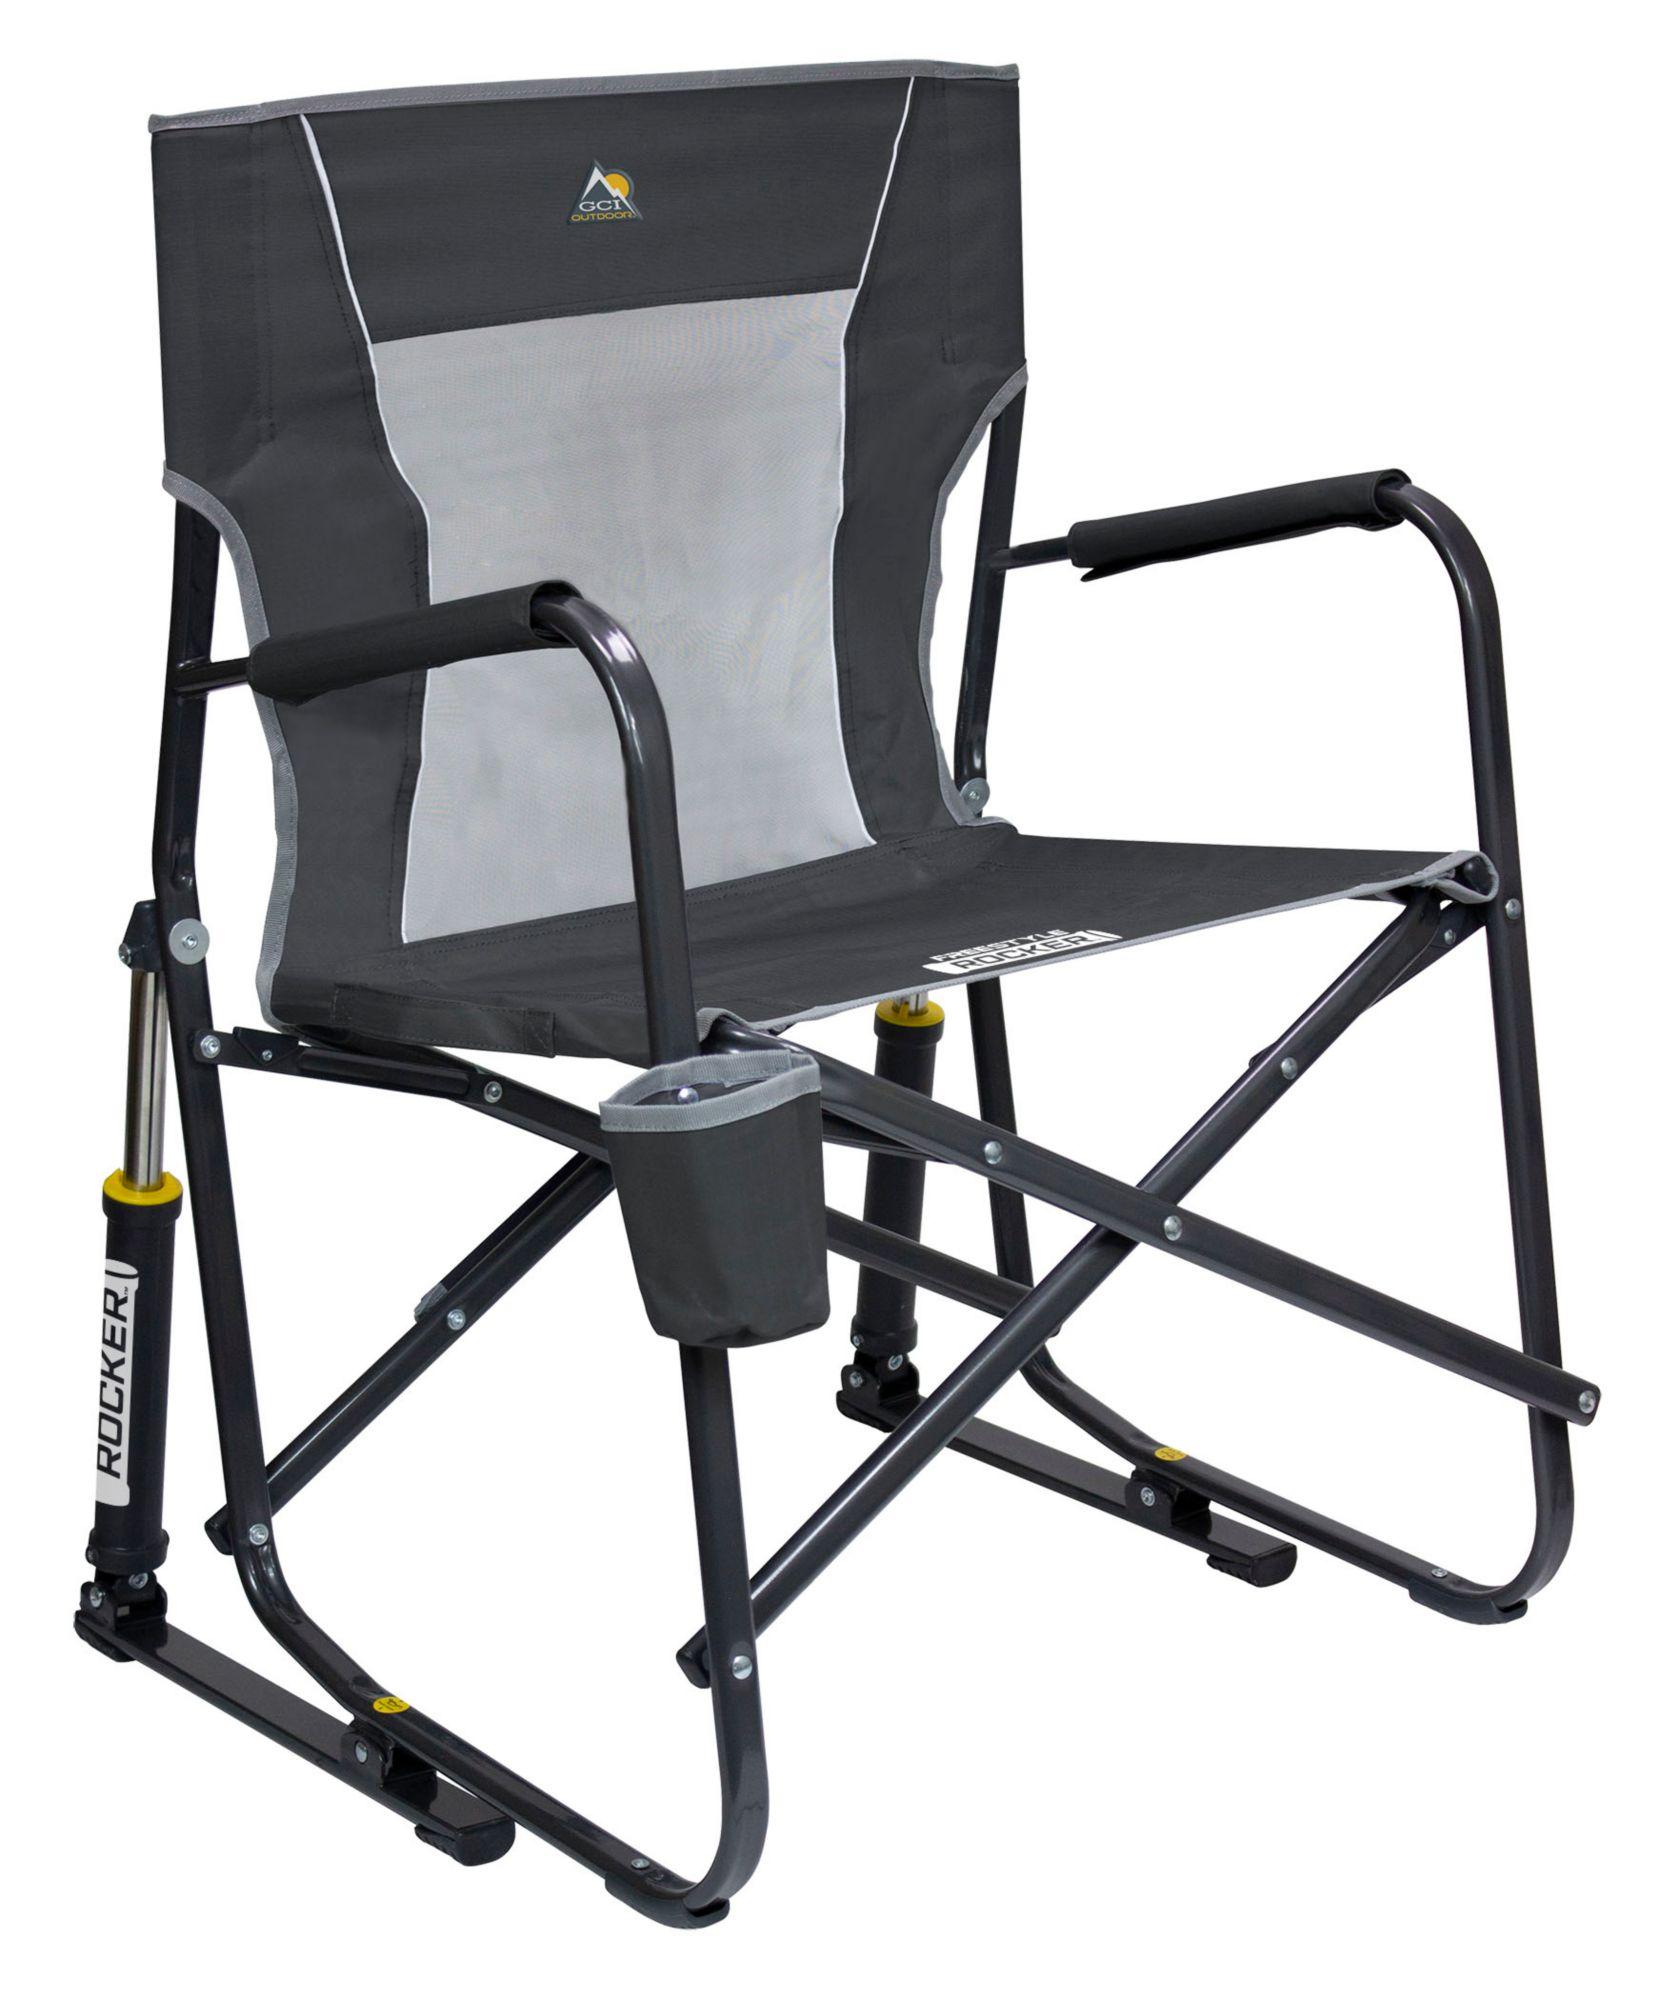 gci outdoor freestyle rocker GCI Outdoor Freestyle Rocker Mesh Chair /(Black/) gci outdoor freestyle rocker